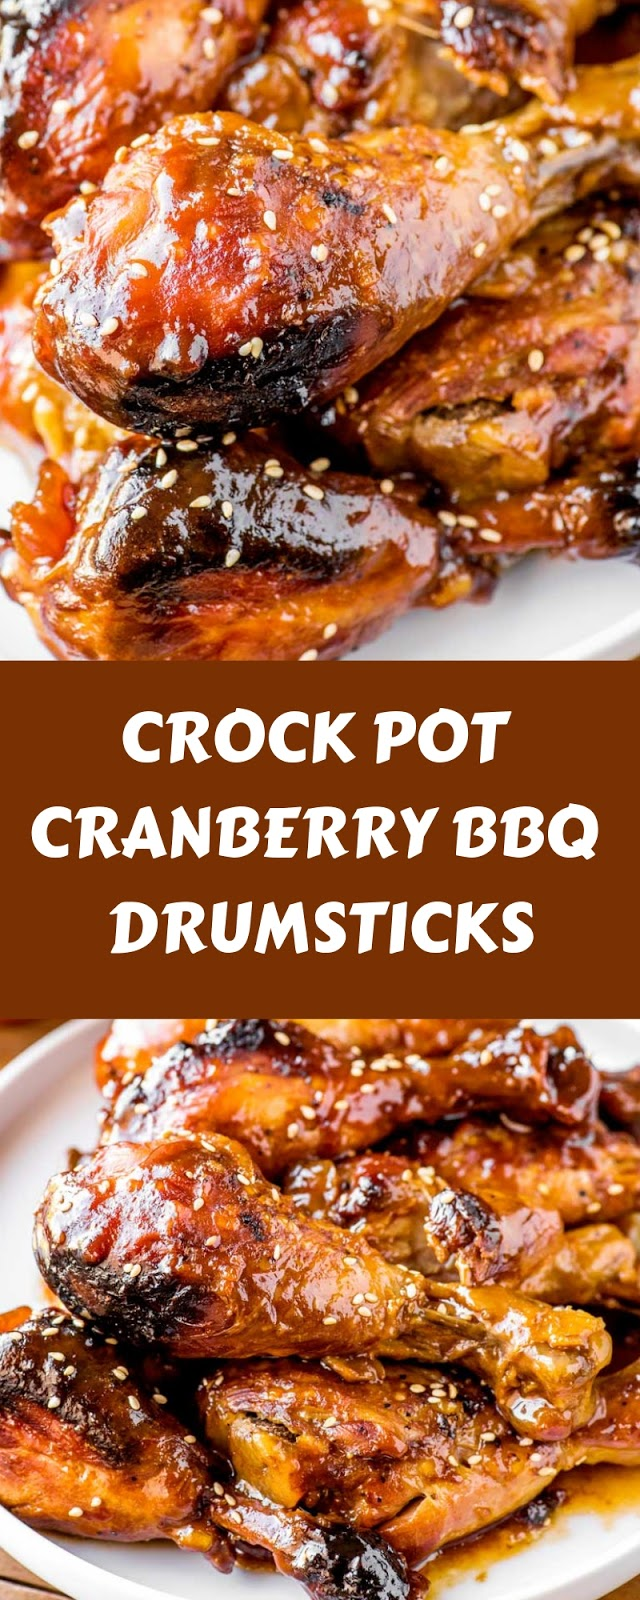 CROCK POT CRANBERRY BBQ DRUMSTICKS